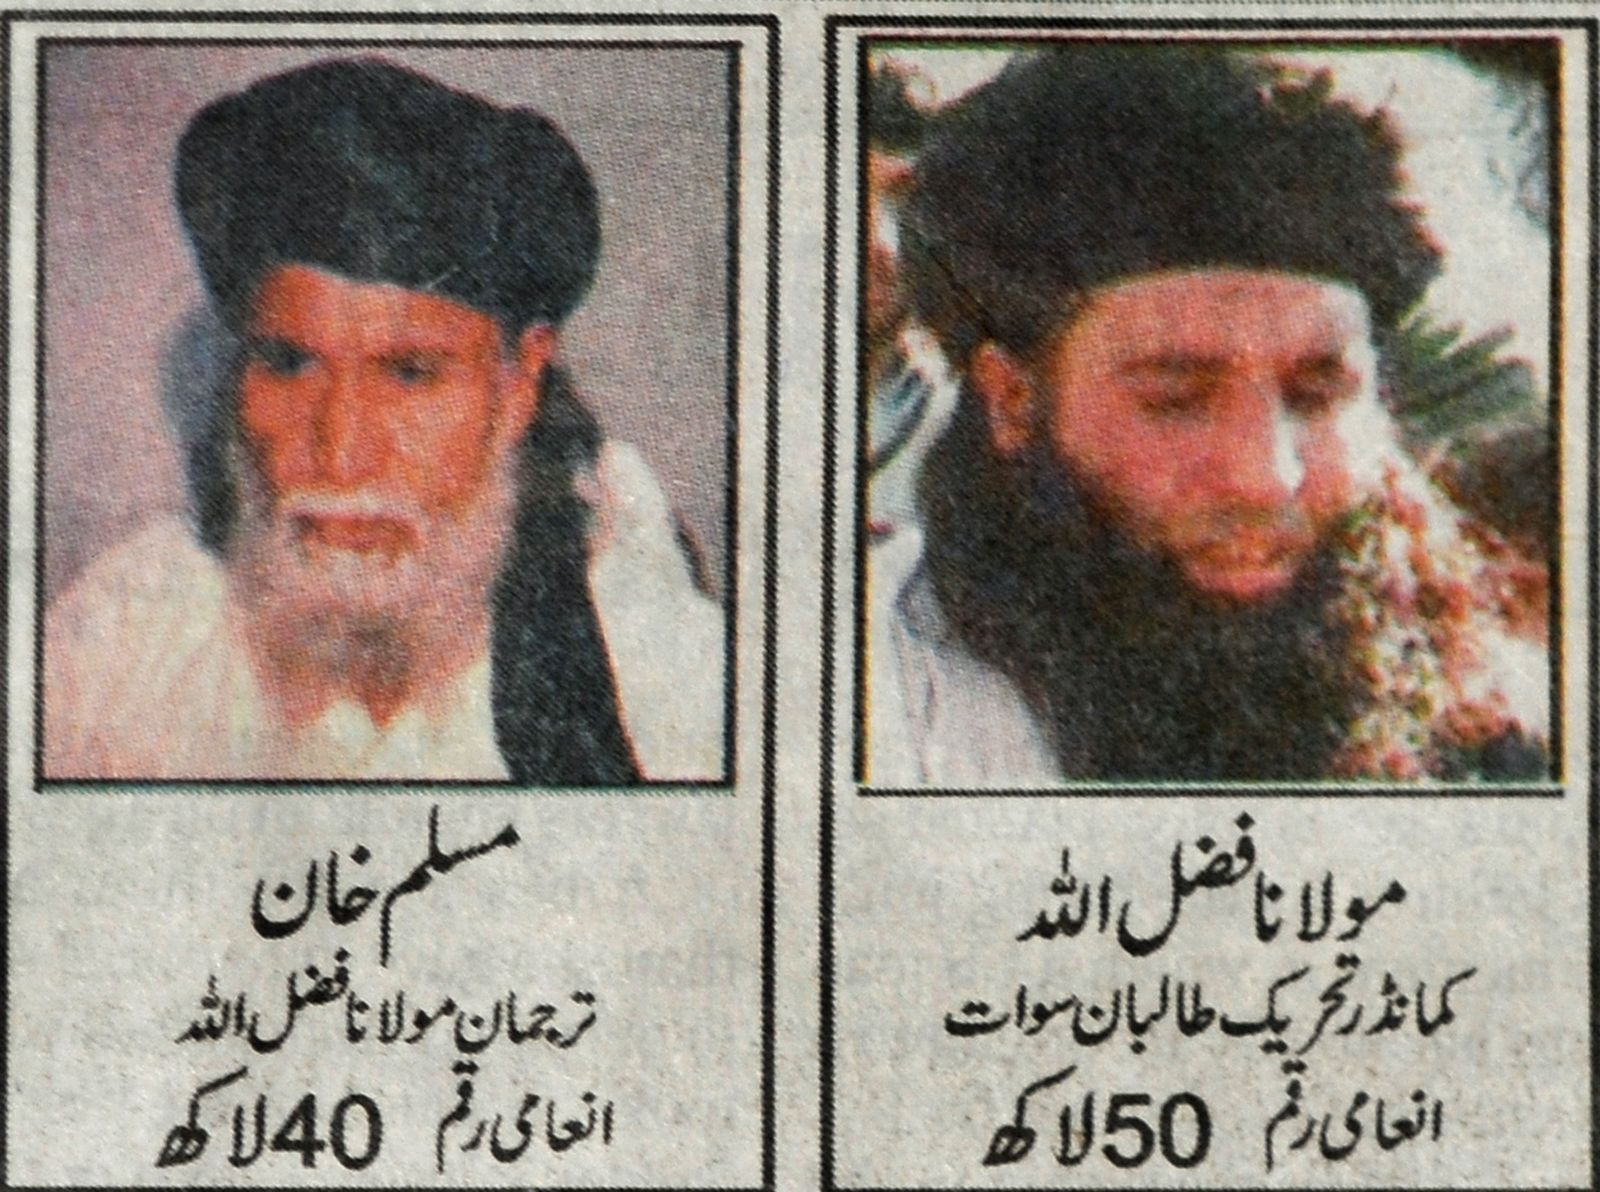 Maulana Fazlluah